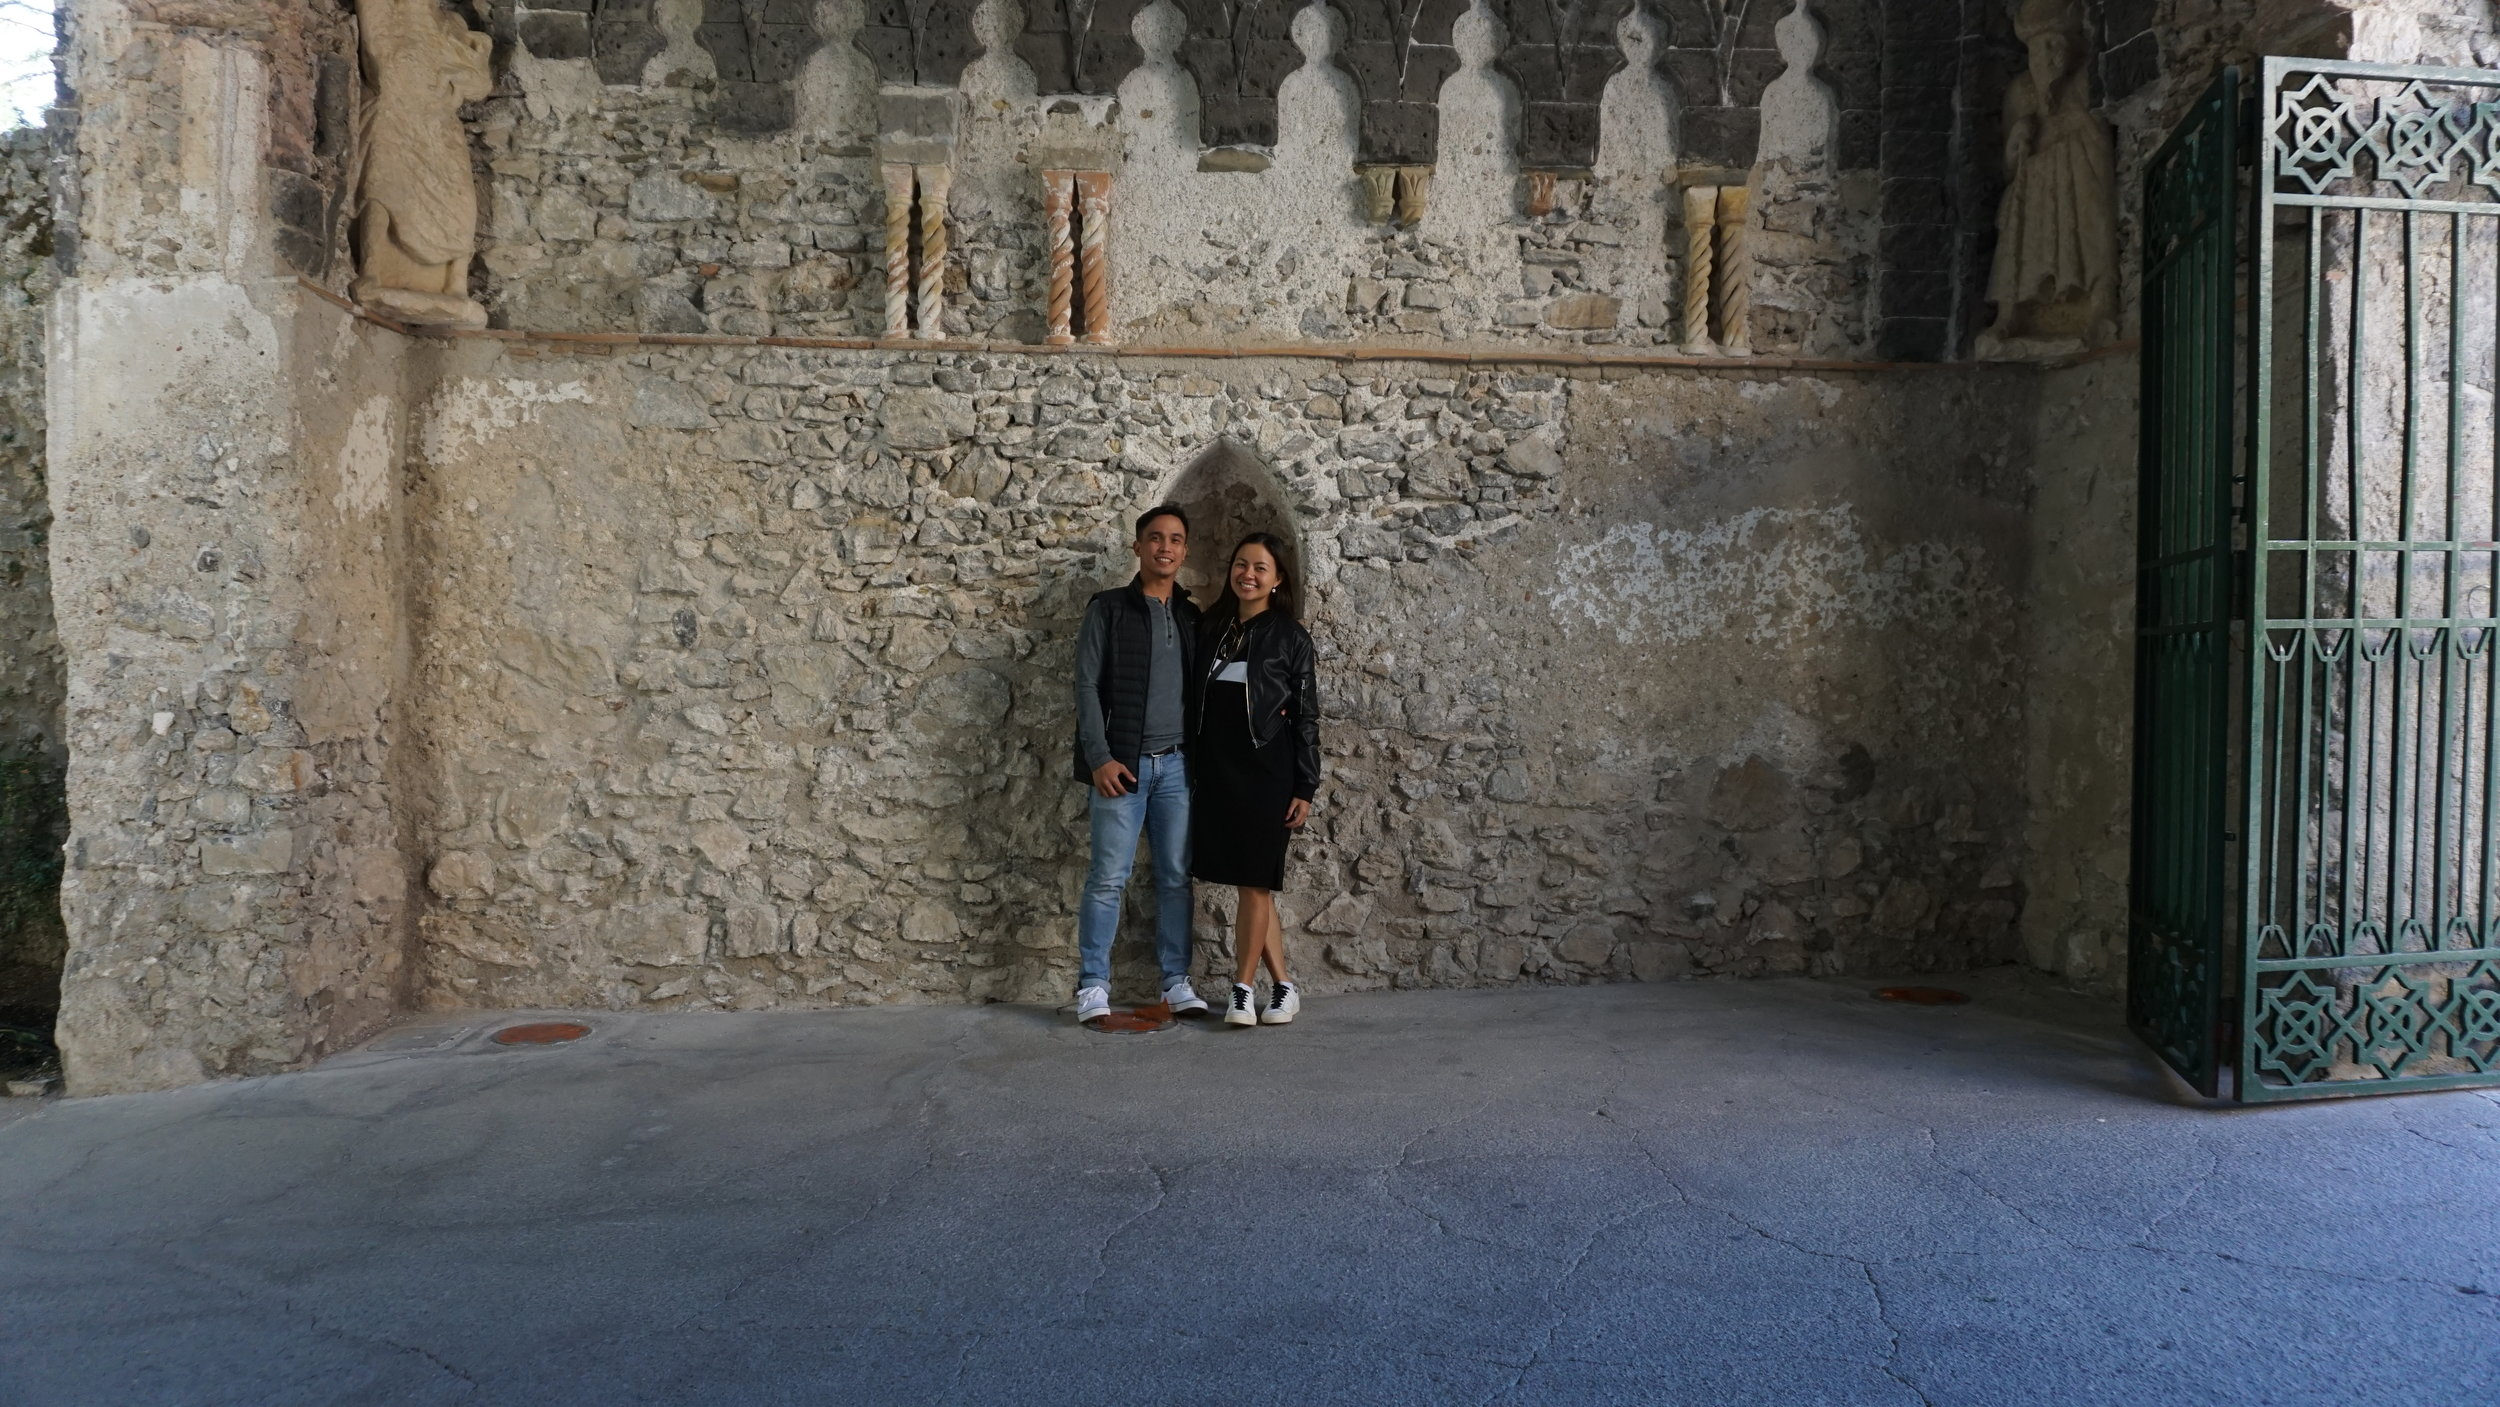 Photo at the entrance of Villa Rufolo.